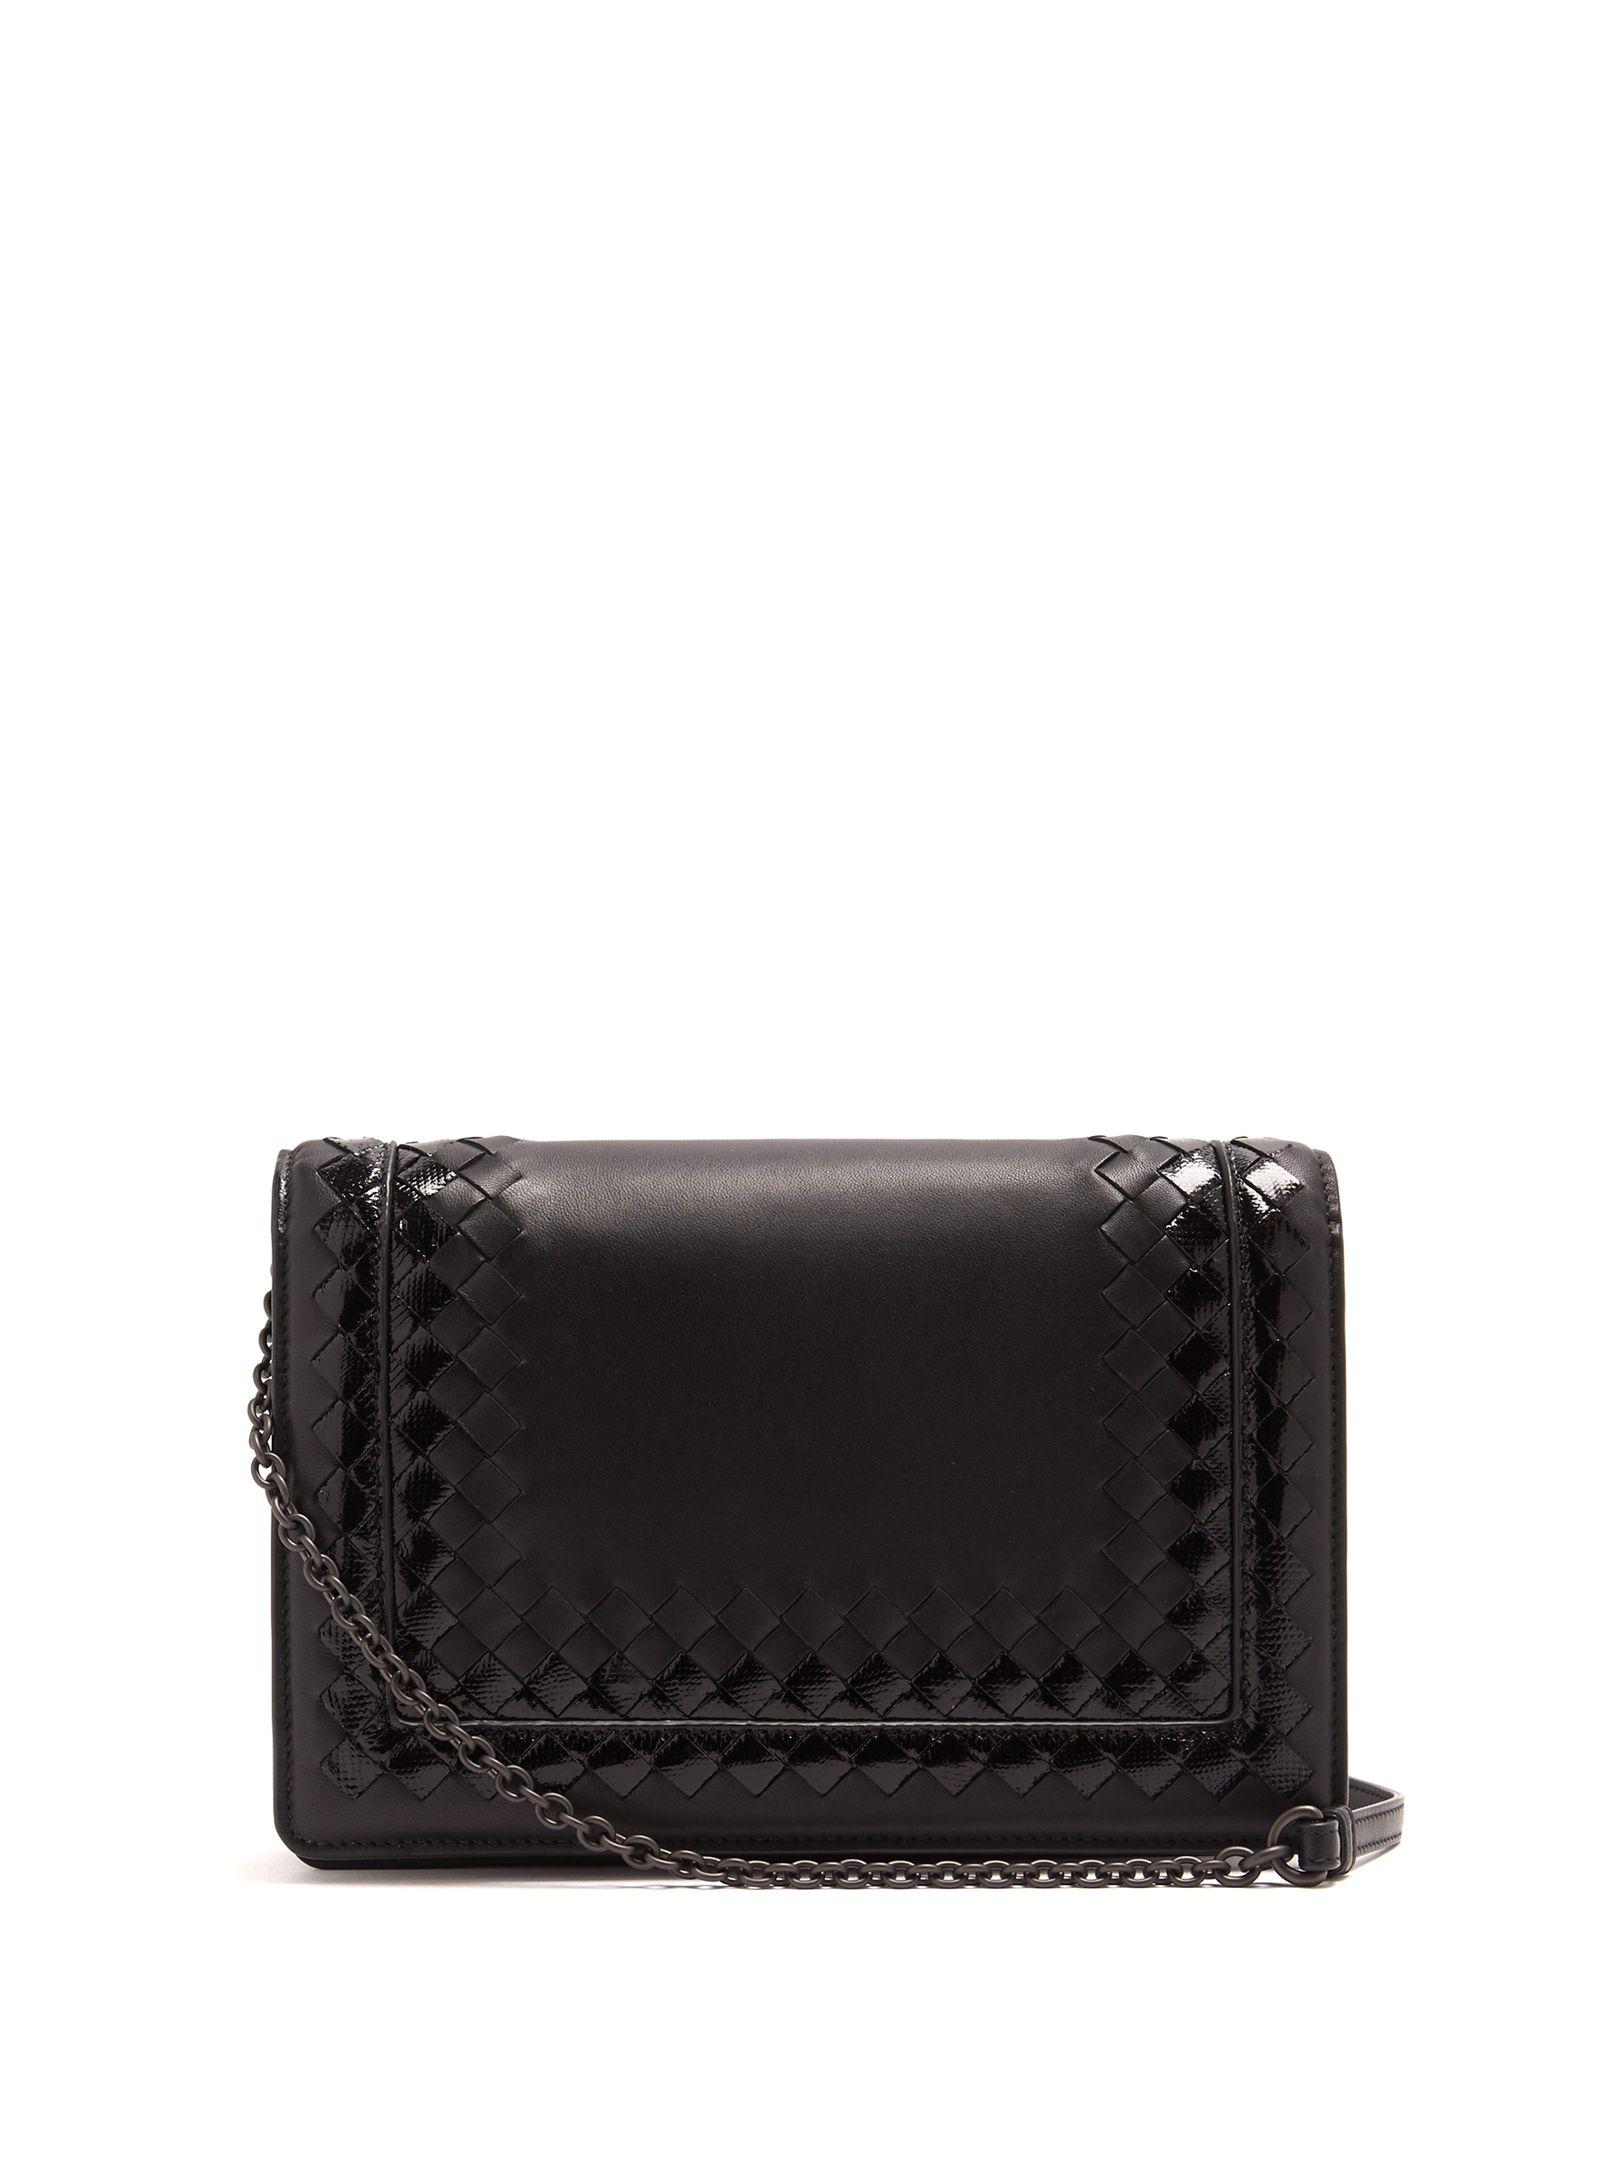 7ada8c9ef1 BOTTEGA VENETA Montebello leather shoulder bag.  bottegaveneta  bags   shoulder bags  leather